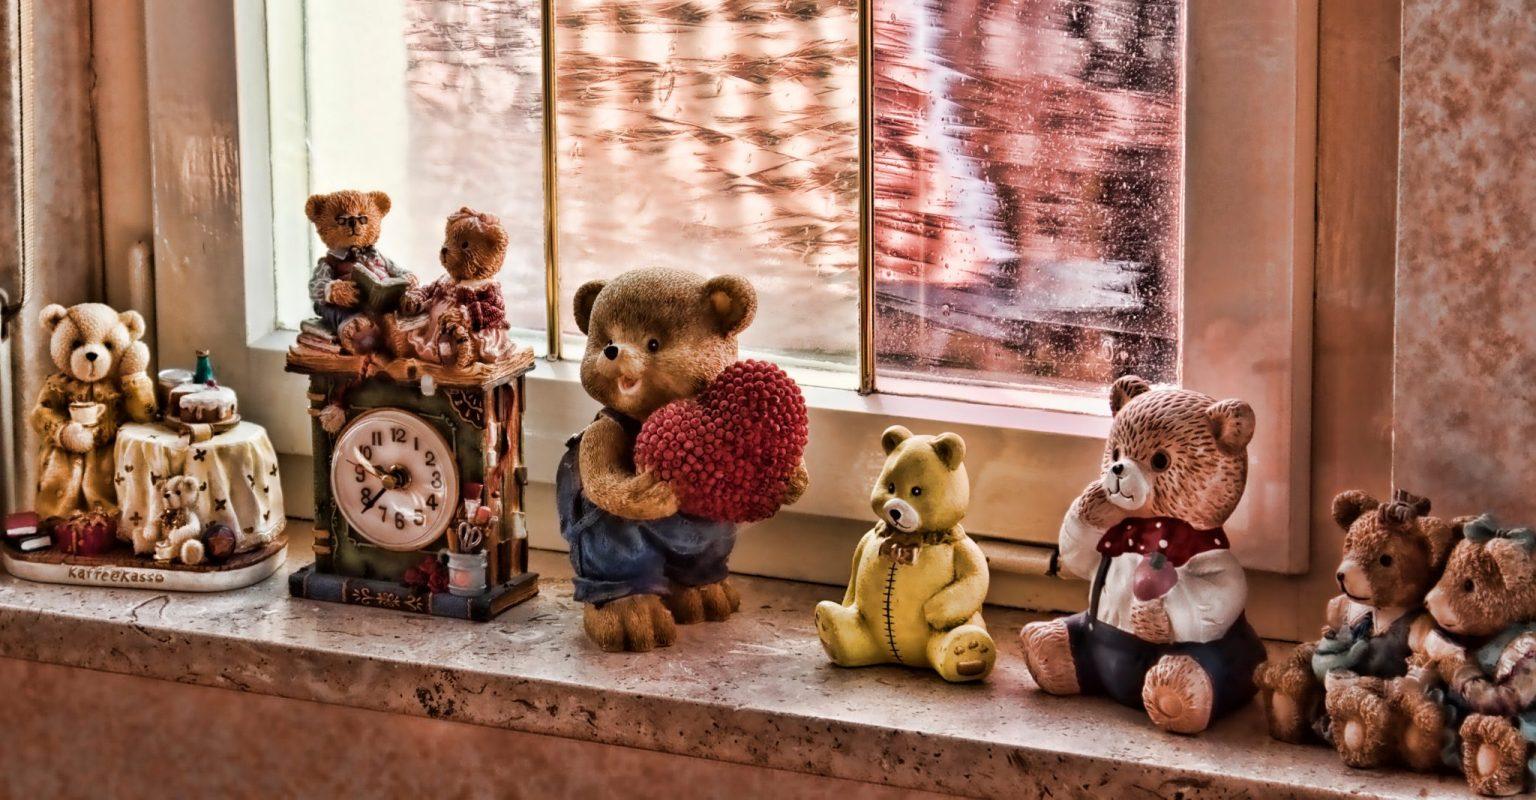 Toys: Teddy bears in Germany